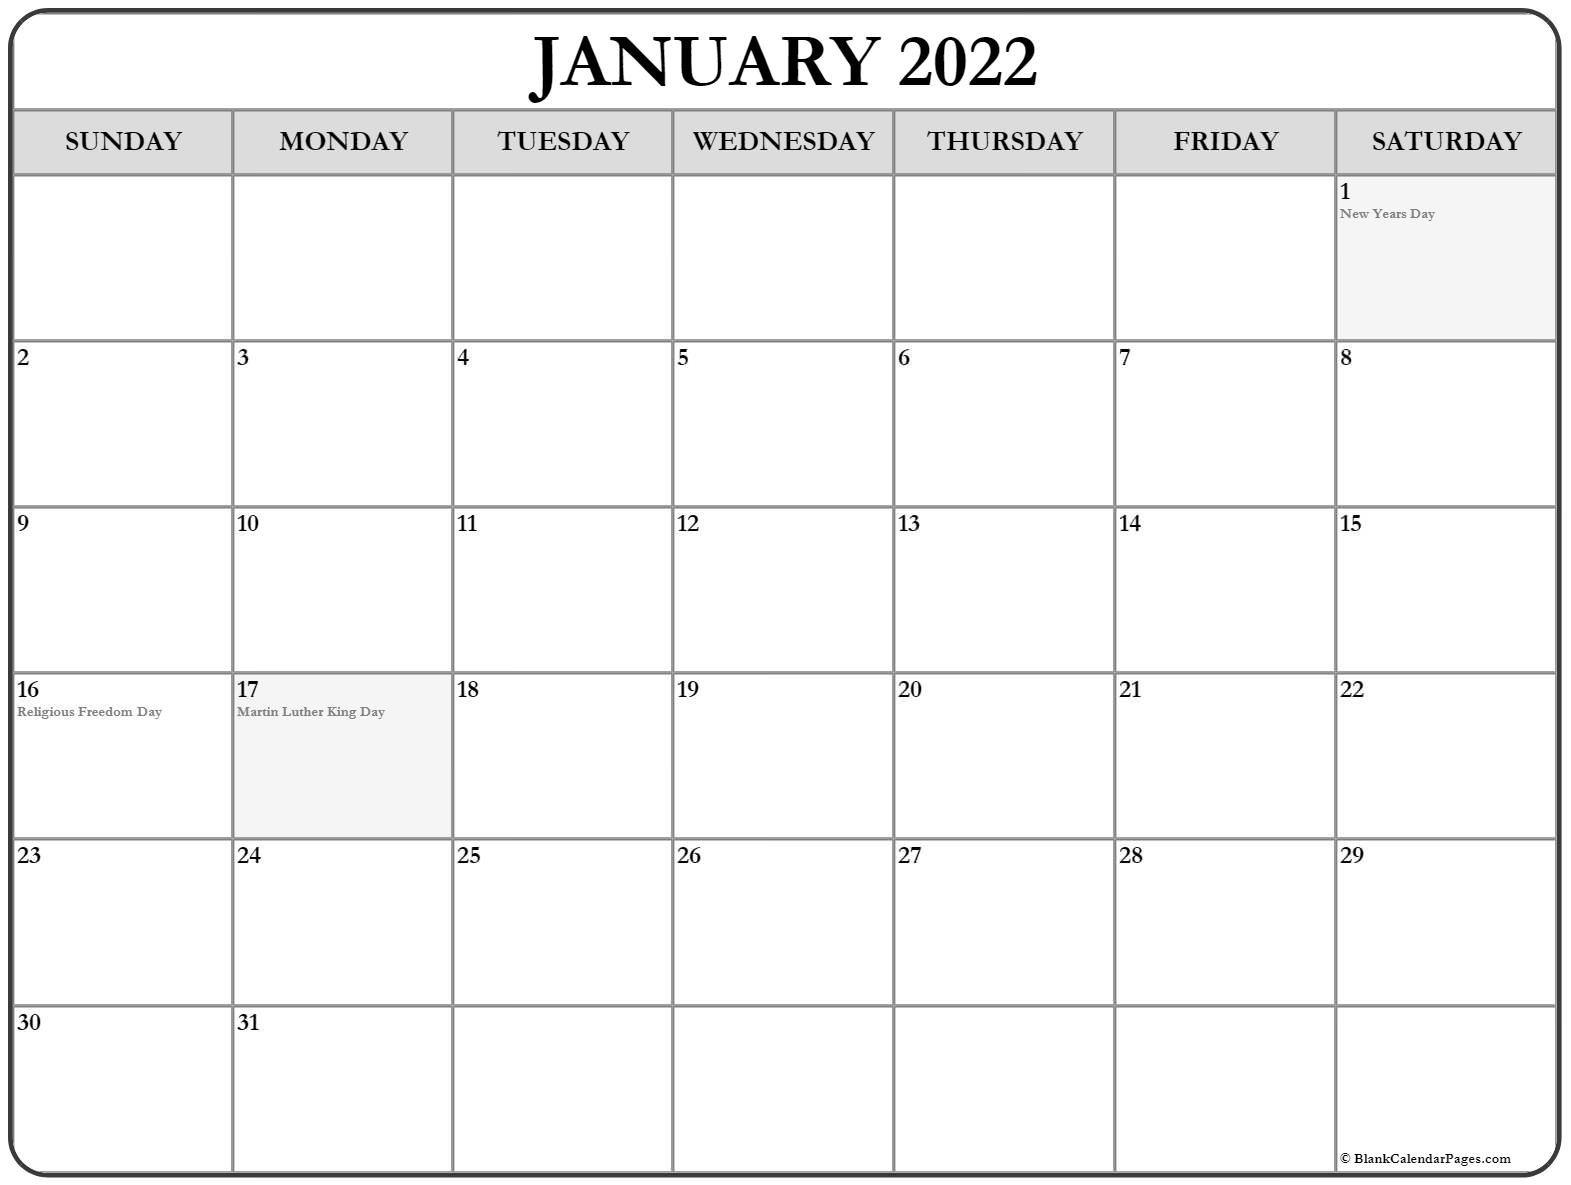 January 2022 With Holidays Calendar regarding Free Printable Printable Pdf January 2022 Calendar